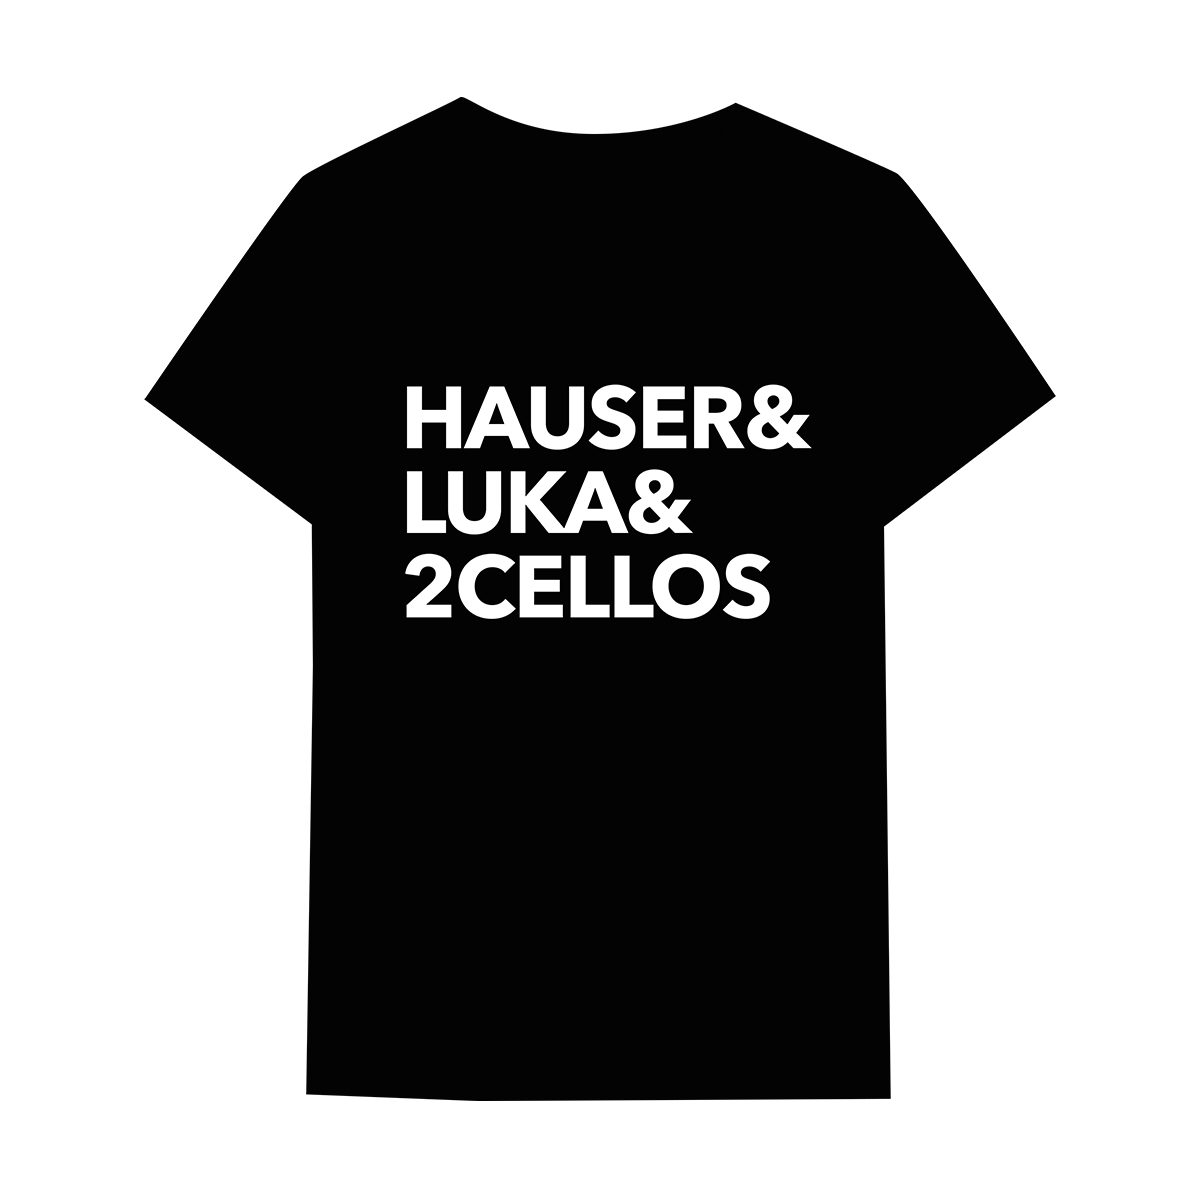 Buy Online 2 Cellos - Hauser & Luka & 2CELLOS Black T-Shirt